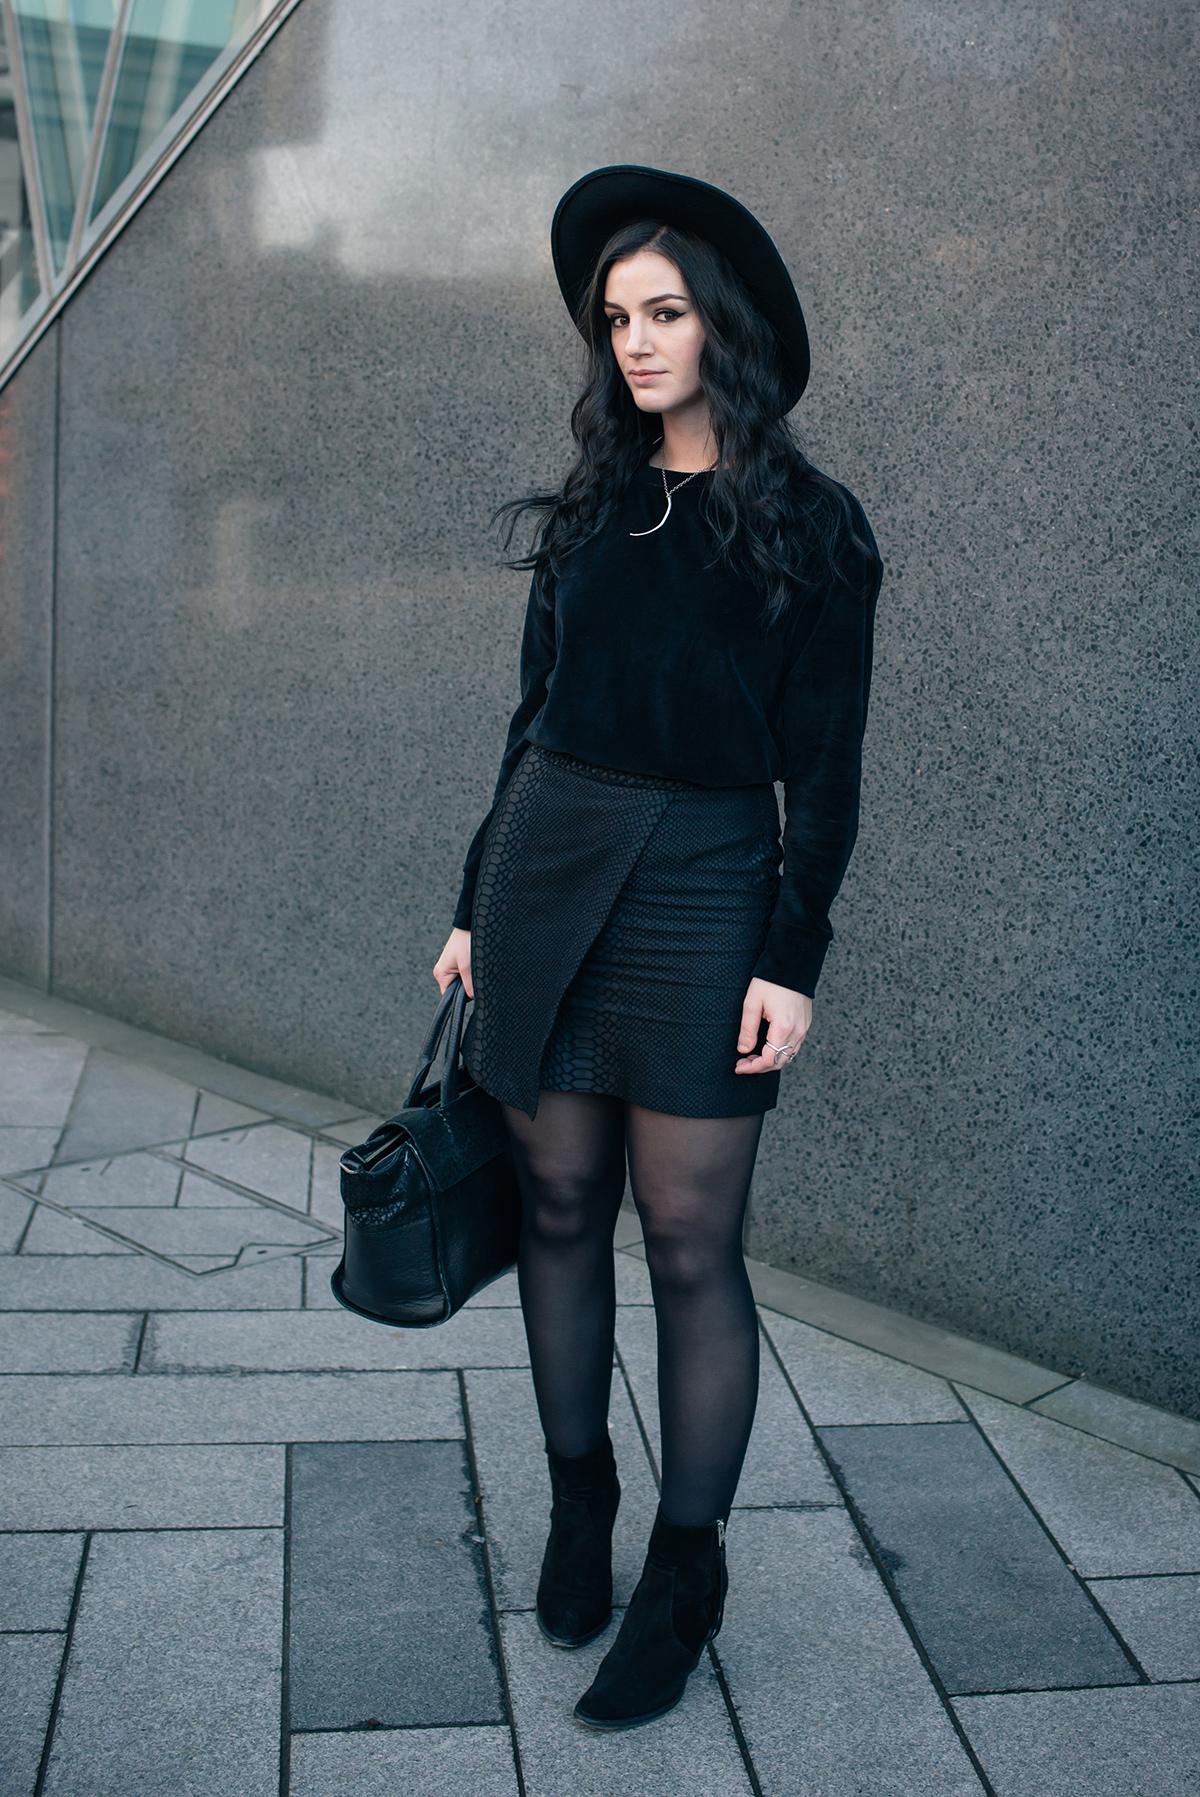 Fashion blogger Stephanie FAIIINT wearing Le Tee Paris velvet sweatshirt, Topshop snake textured skirt, All Saints Boots and Wide brim fedora. All black outfit.